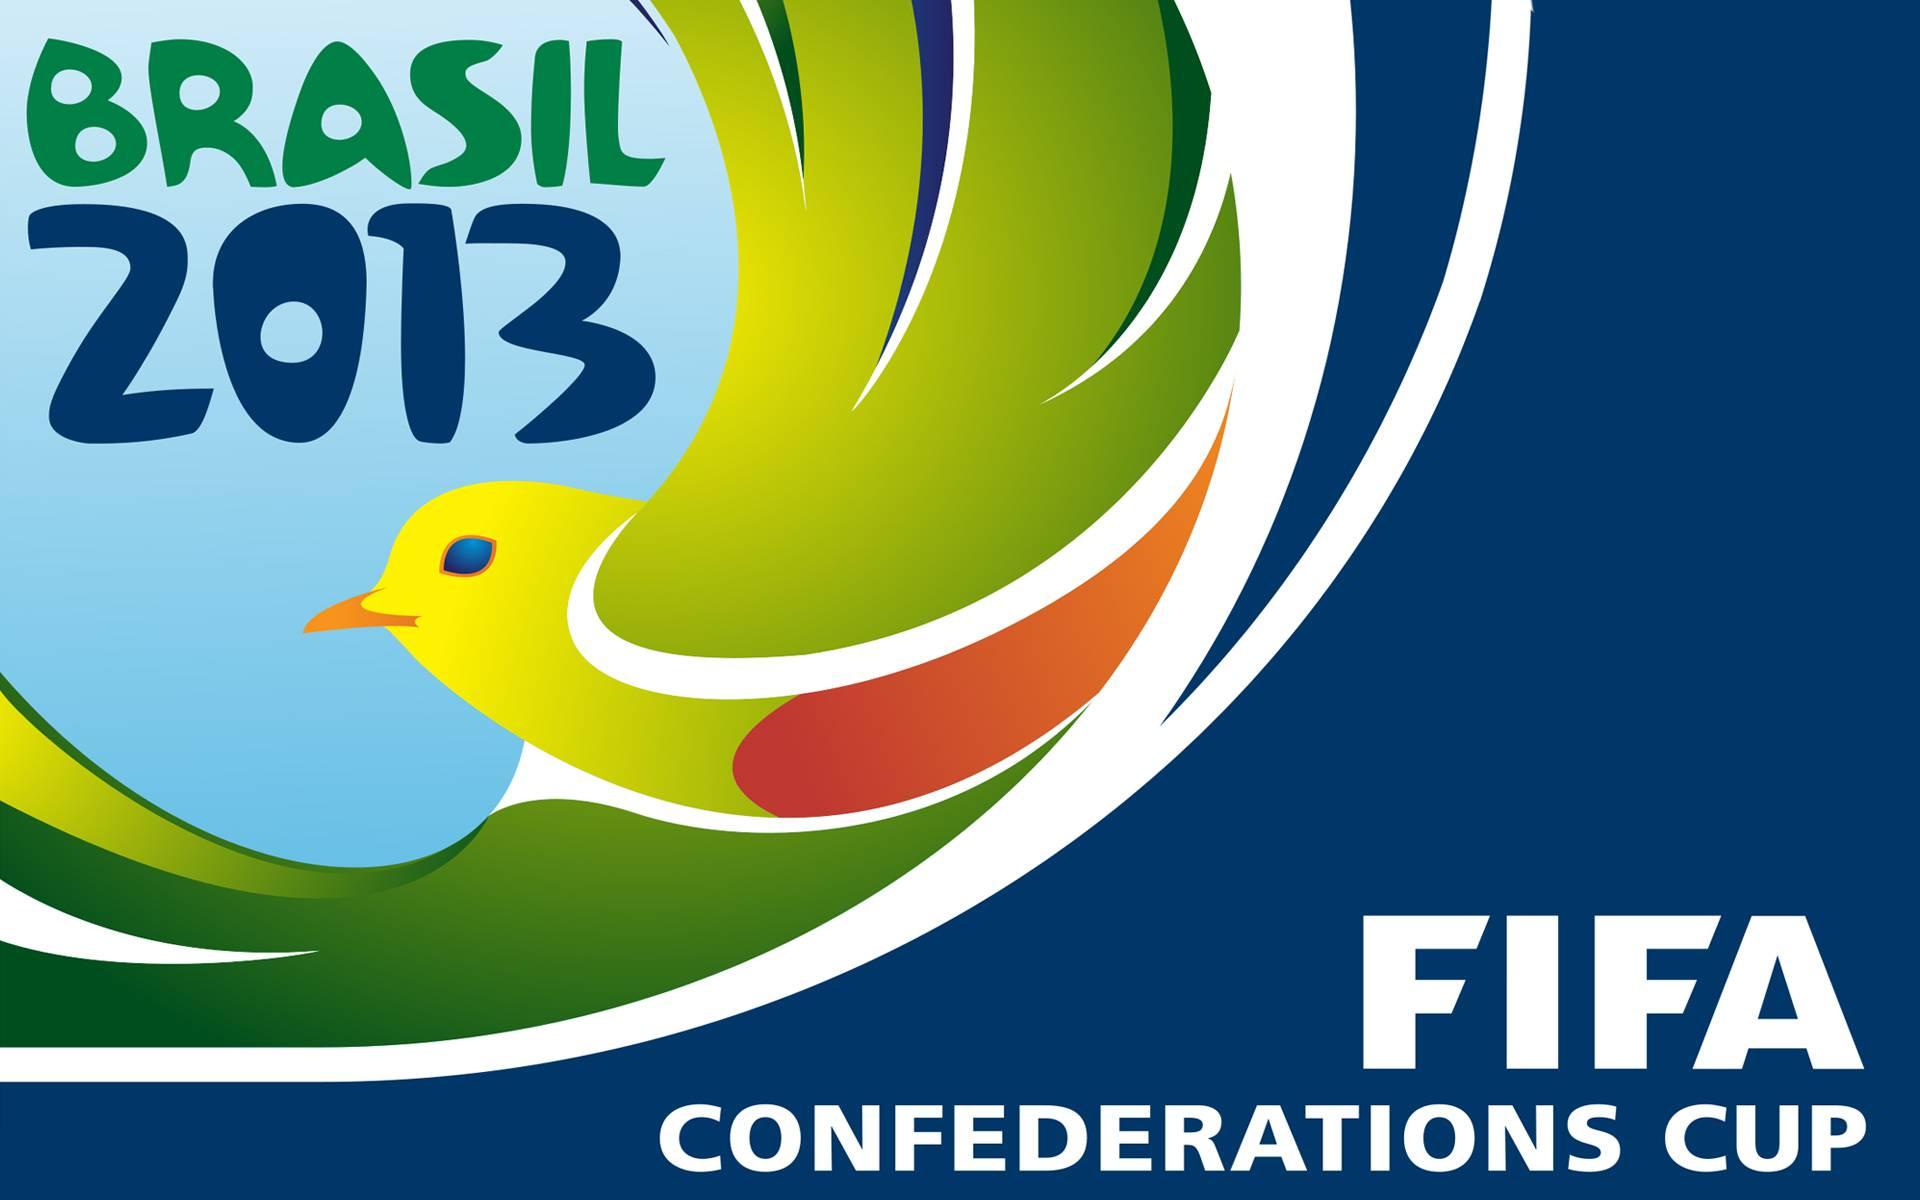 Confederation Cup Calendario.Confederations Cup Ecco Il Calendario Dell Italia Serie A